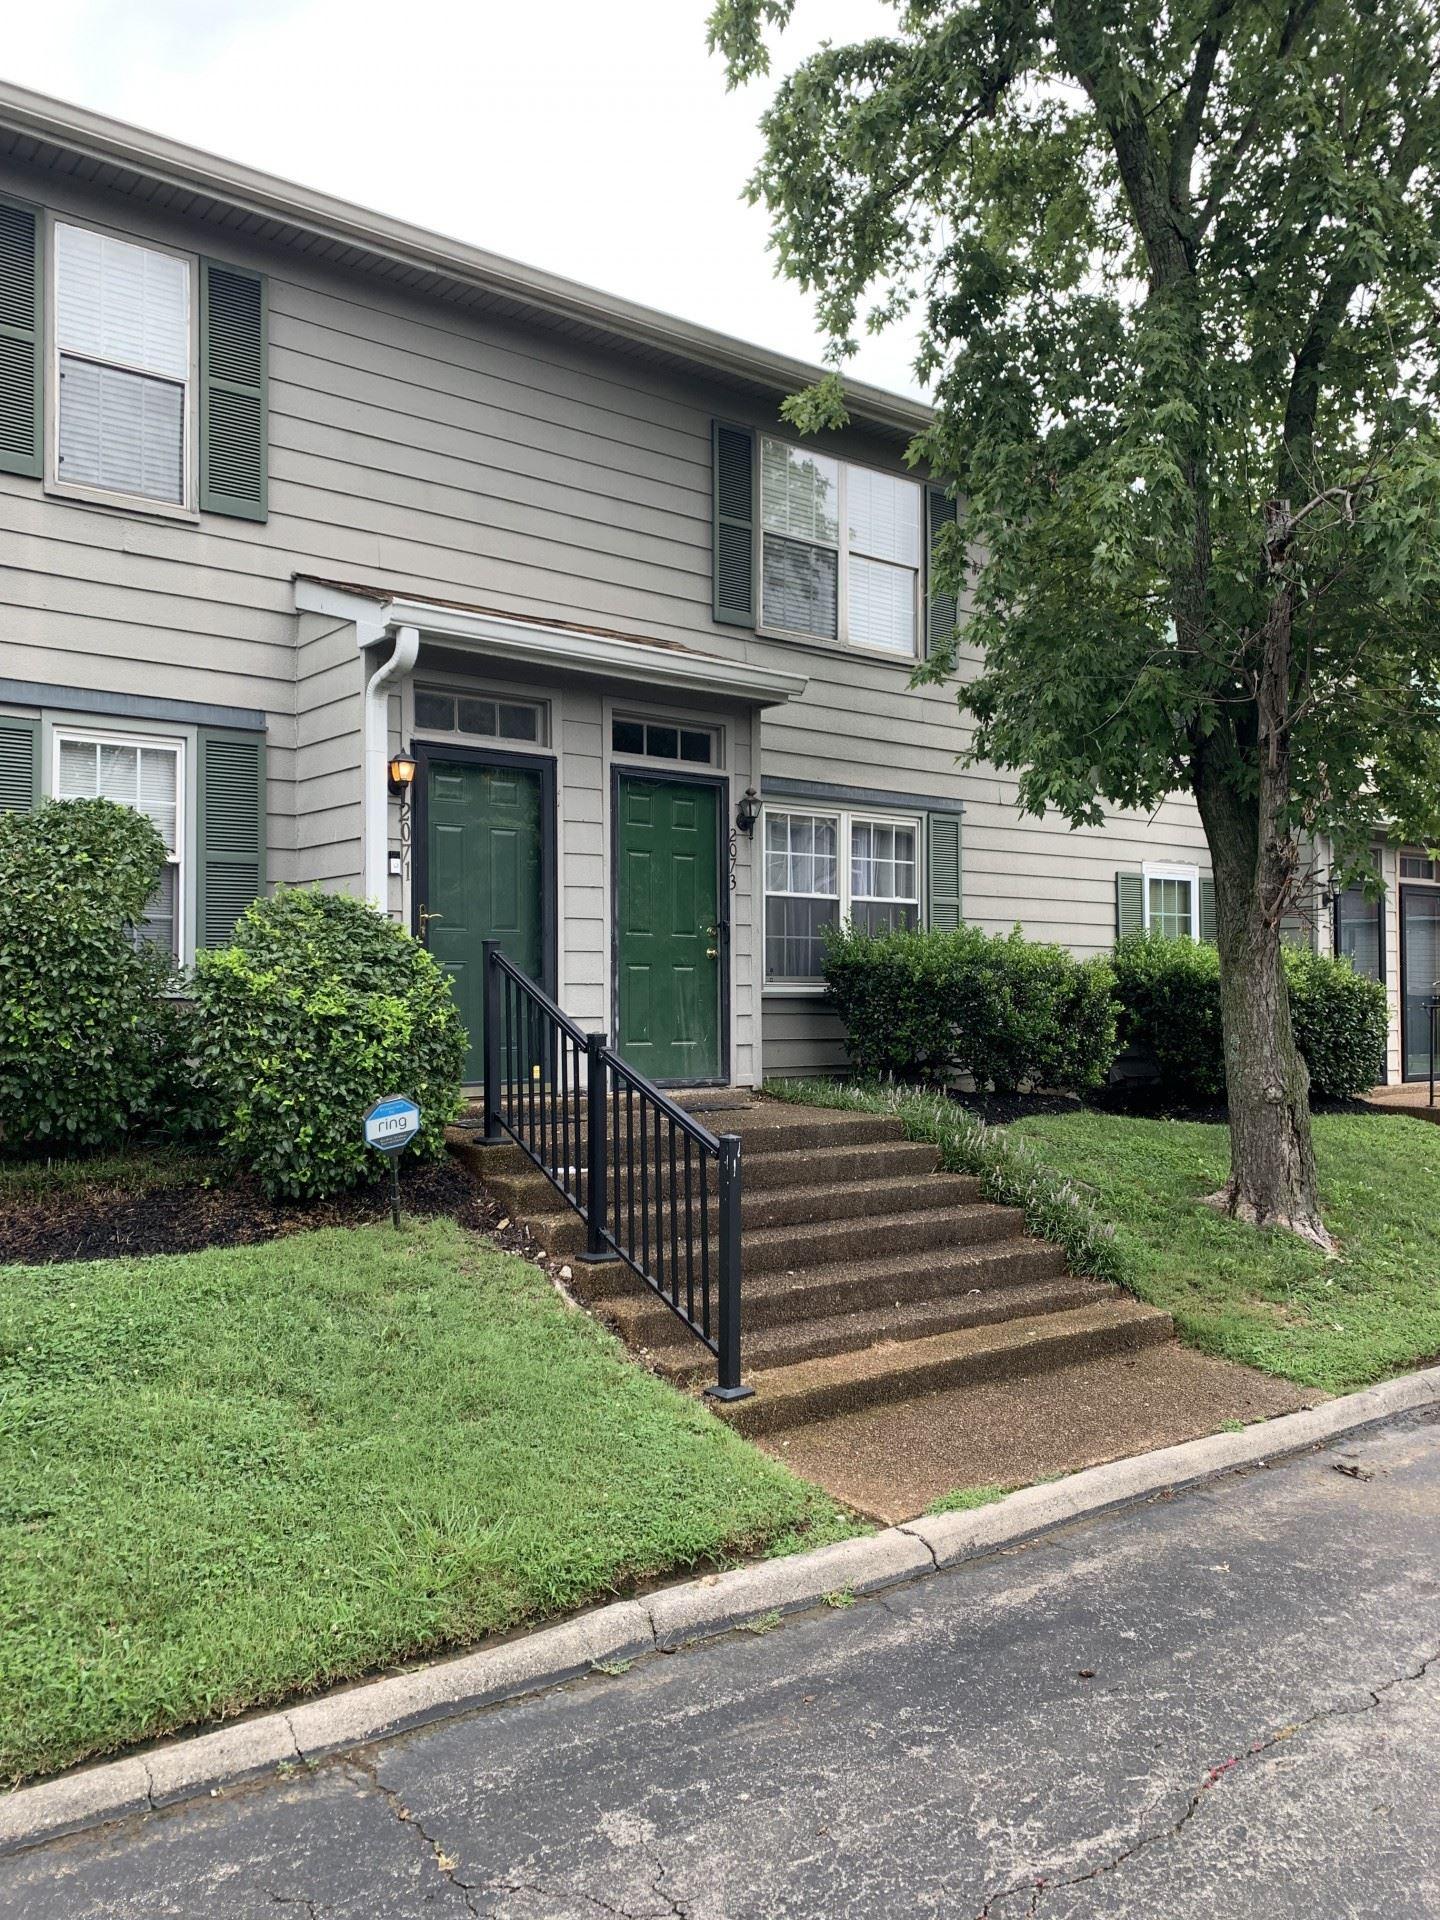 Photo of 2073 Nashboro Blvd, Nashville, TN 37217 (MLS # 2285092)